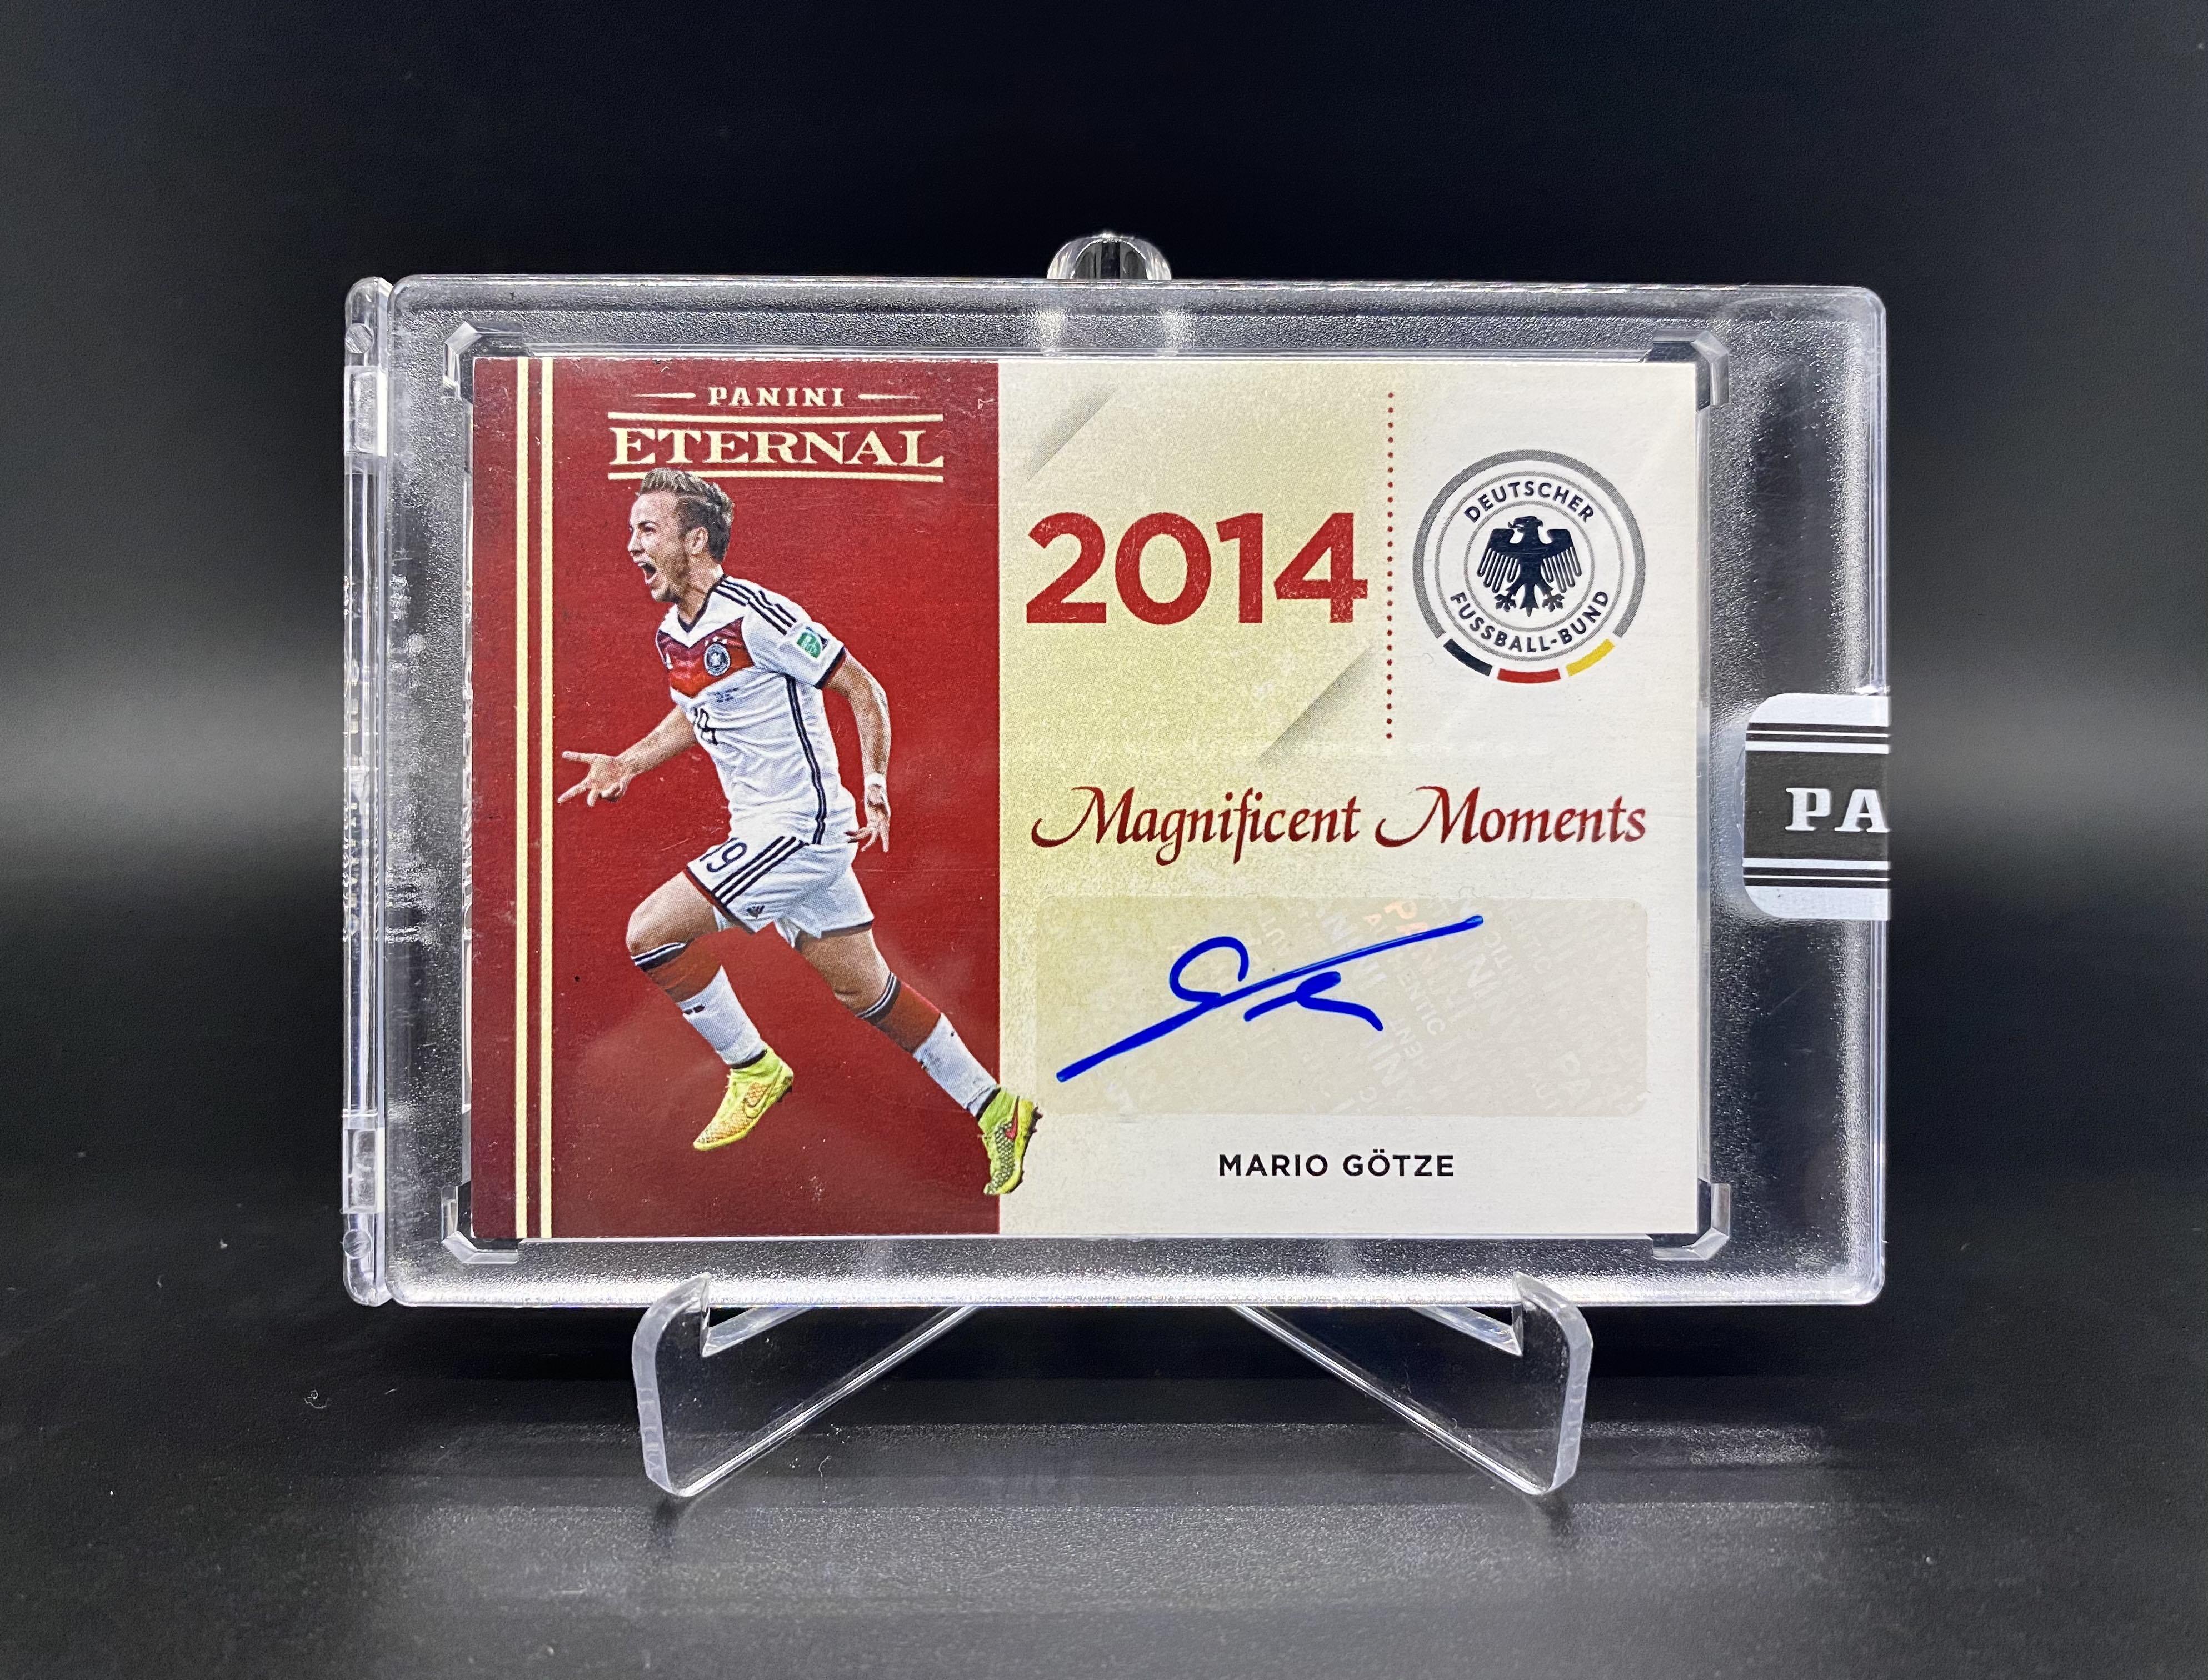 18-19 Panini Eternal 马里奥 格策 辉煌时刻 原封砖 签字 25编 世界杯绝杀梅西带领的阿根廷